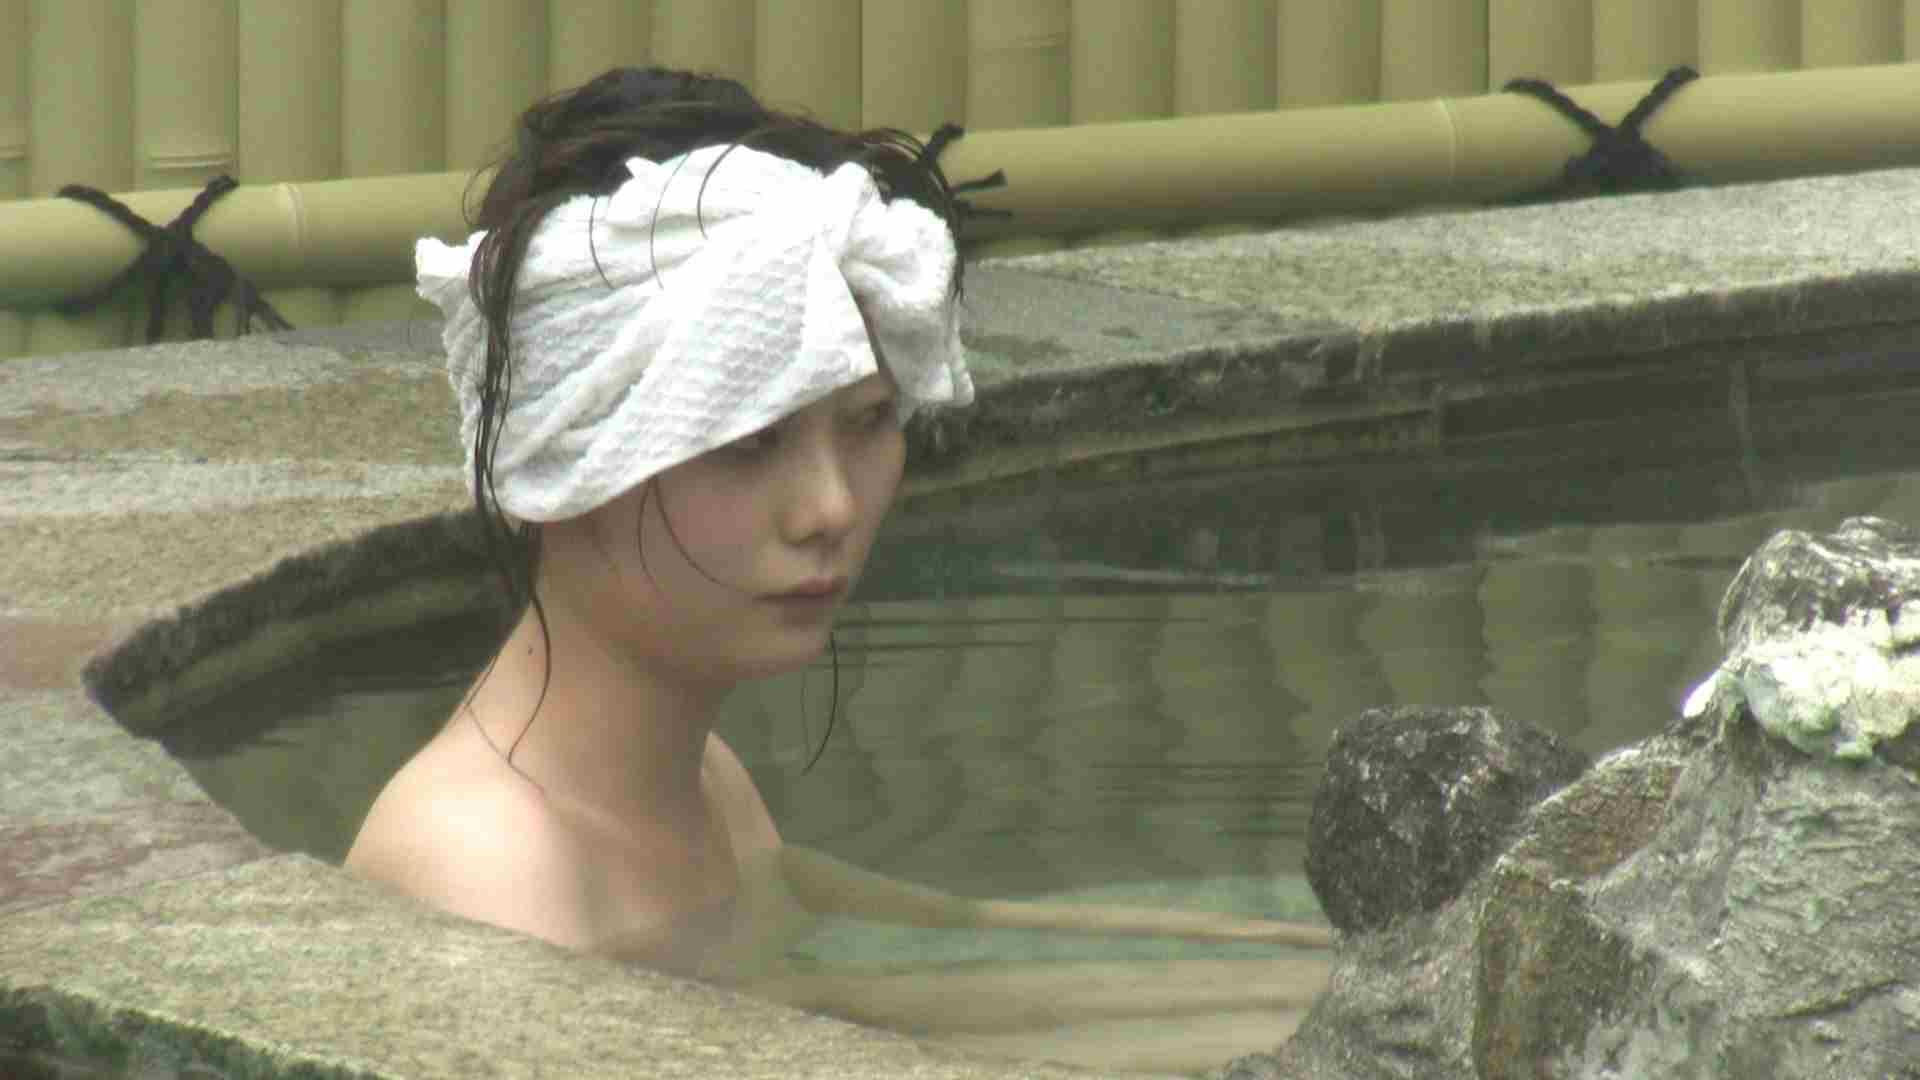 Aquaな露天風呂Vol.147 綺麗なOLたち アダルト動画キャプチャ 102枚 62